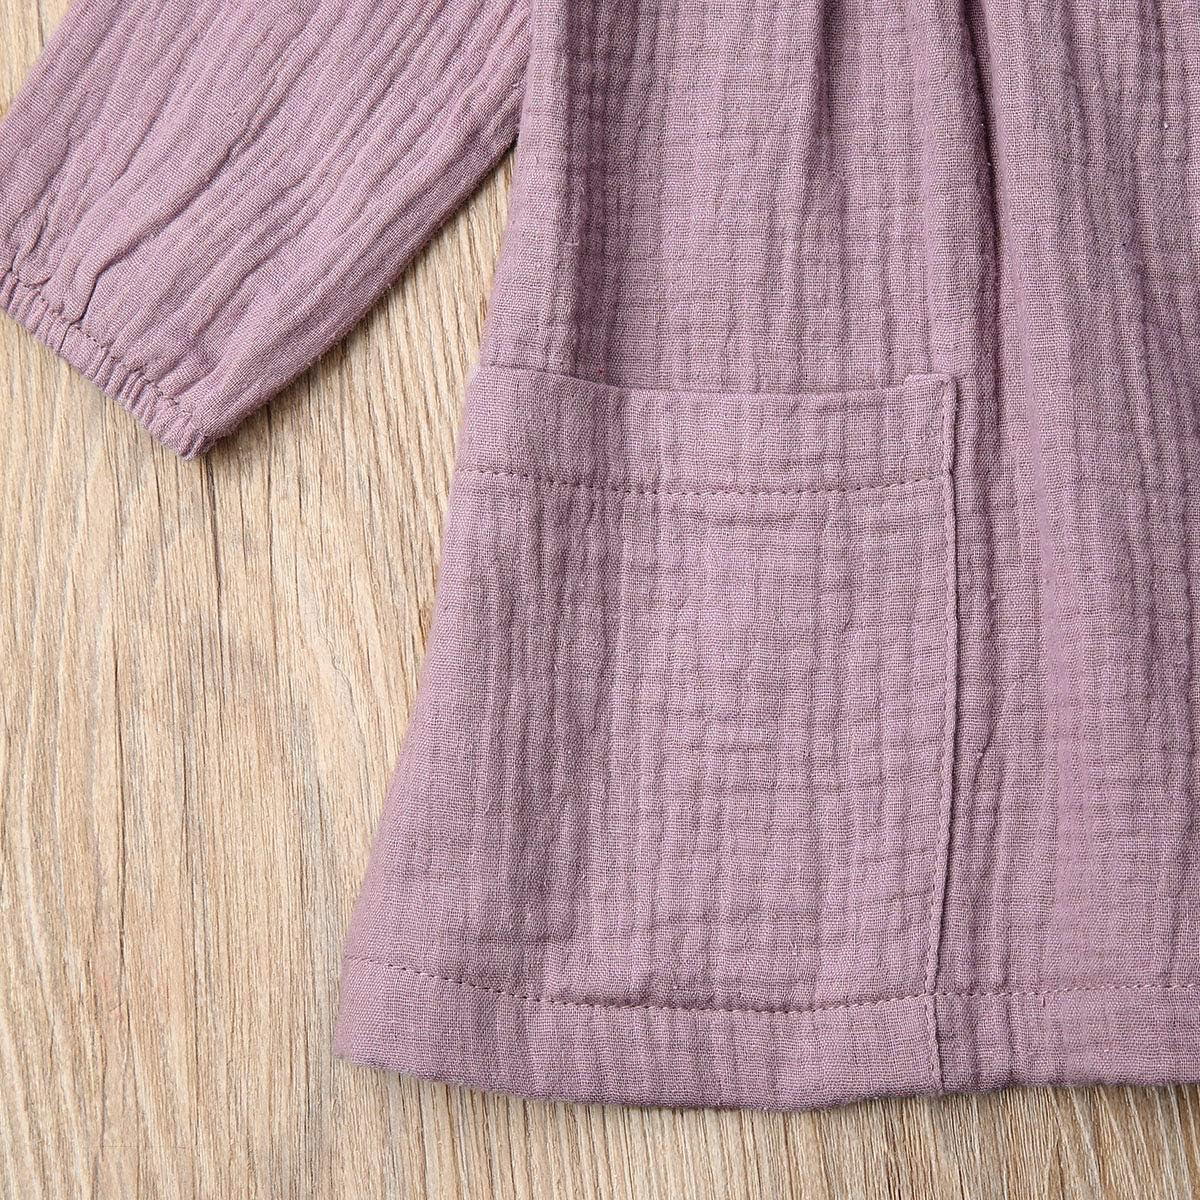 Toddler Baby Girls Long Sleeve Cotton Linen Button Dress Shirt Top with Pockets